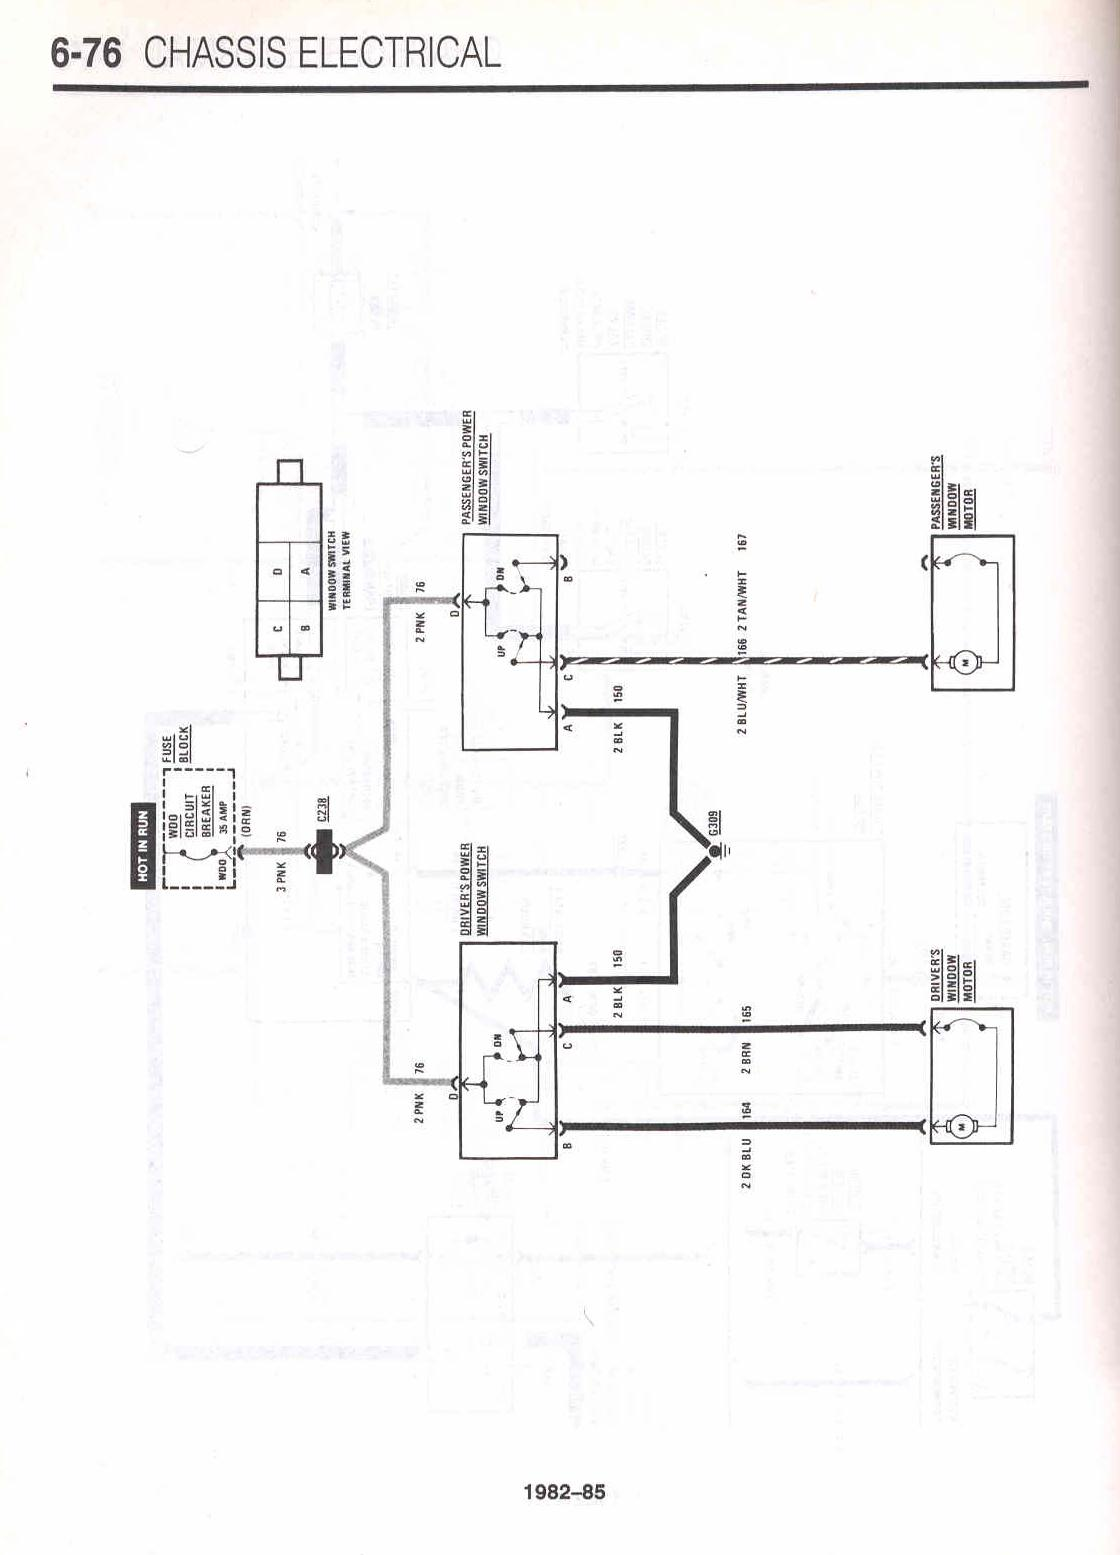 84 cj7 wiring diagram ecm auto electrical wiring diagram 84 cj7 wiring  diagram ecm